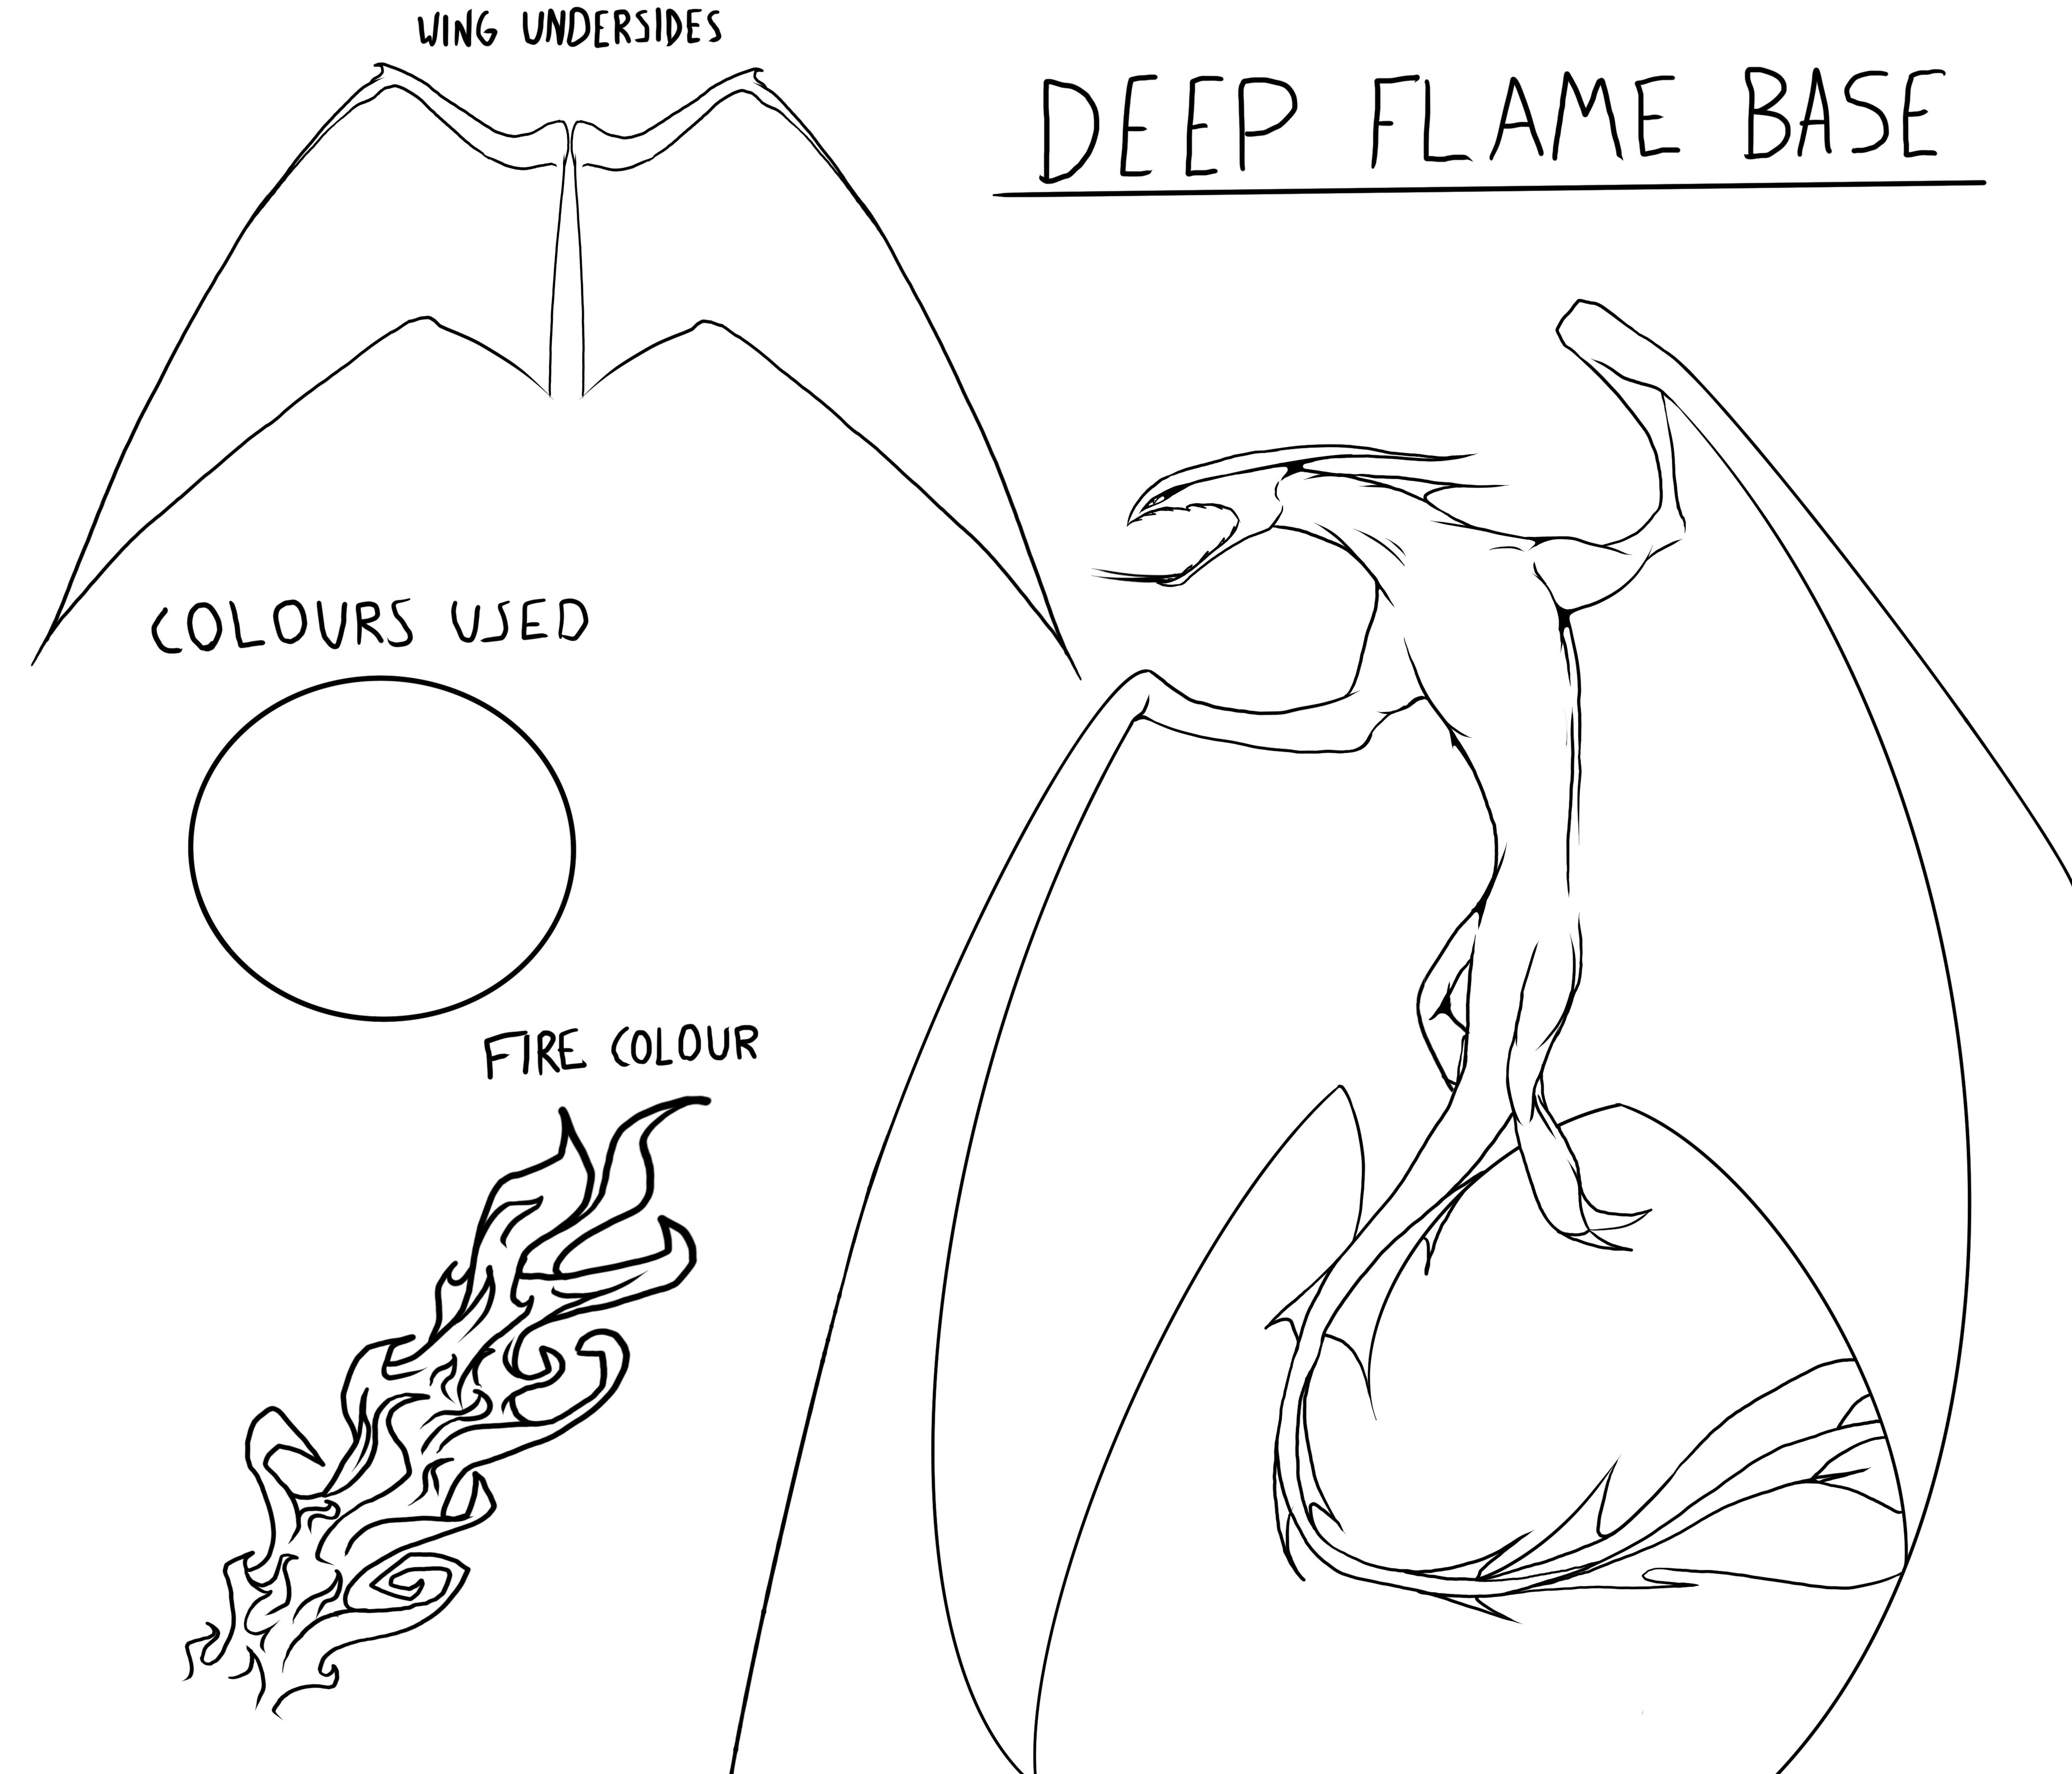 DeepFlame3/Deep Flame base!